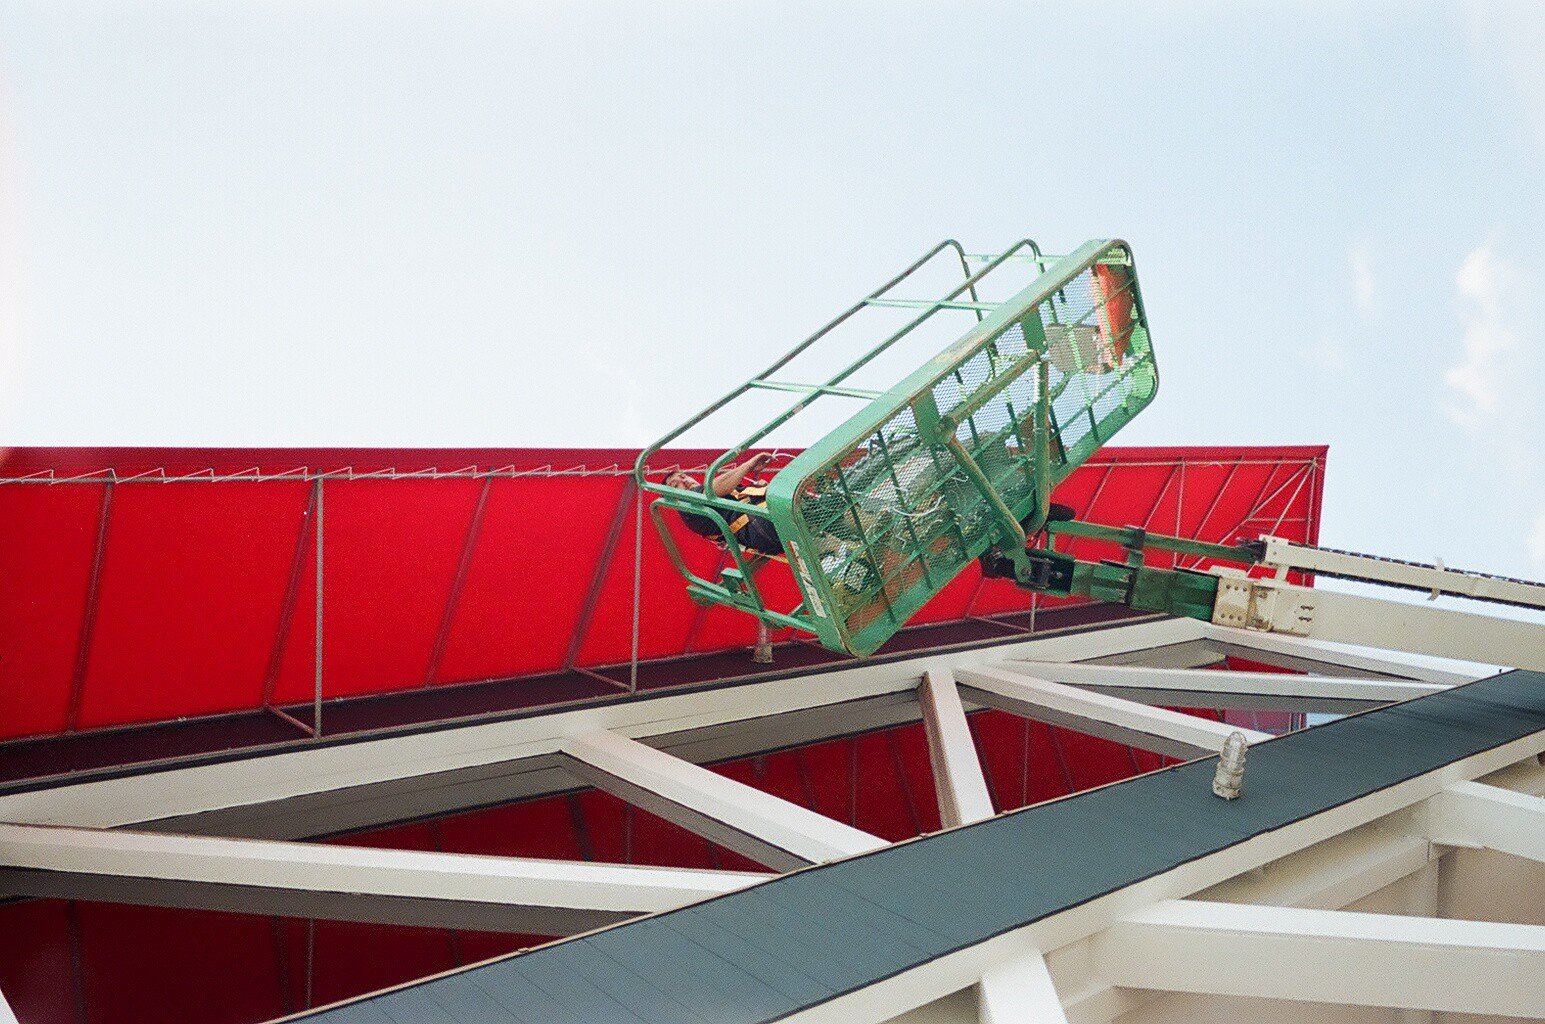 High Lift Capabilites